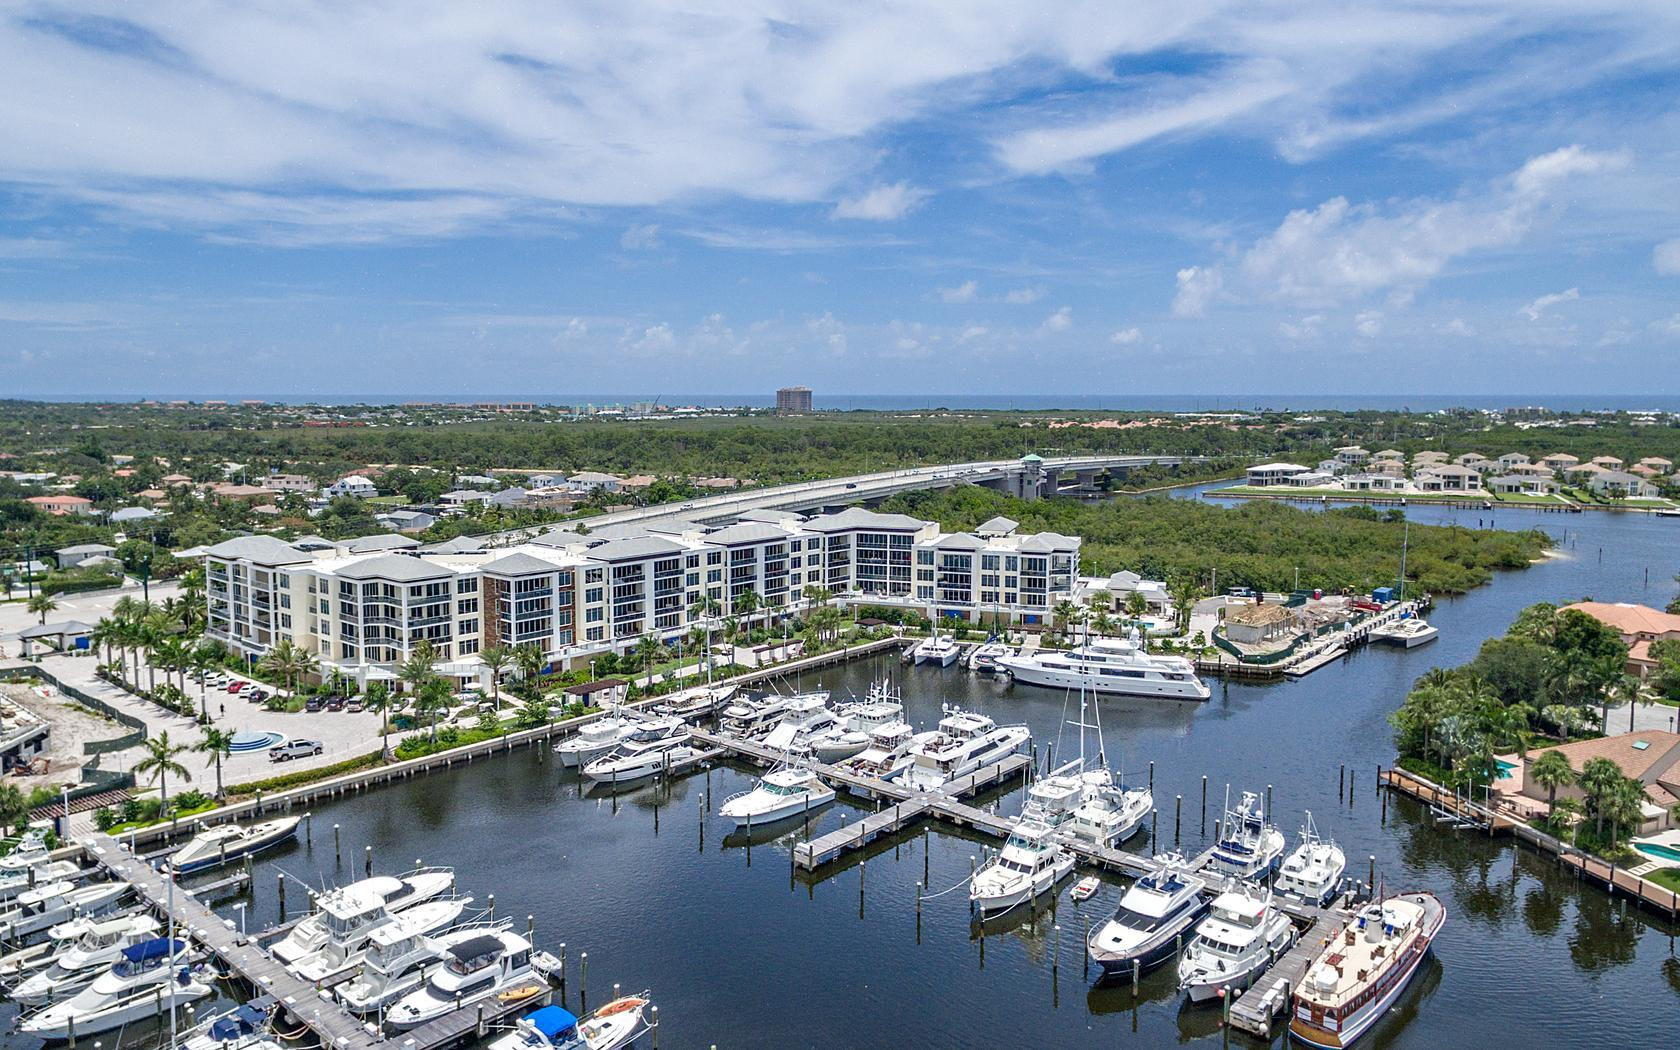 Azure - 4 properties for sale, Palm Beach Gardens,33410 FL. Boca ...